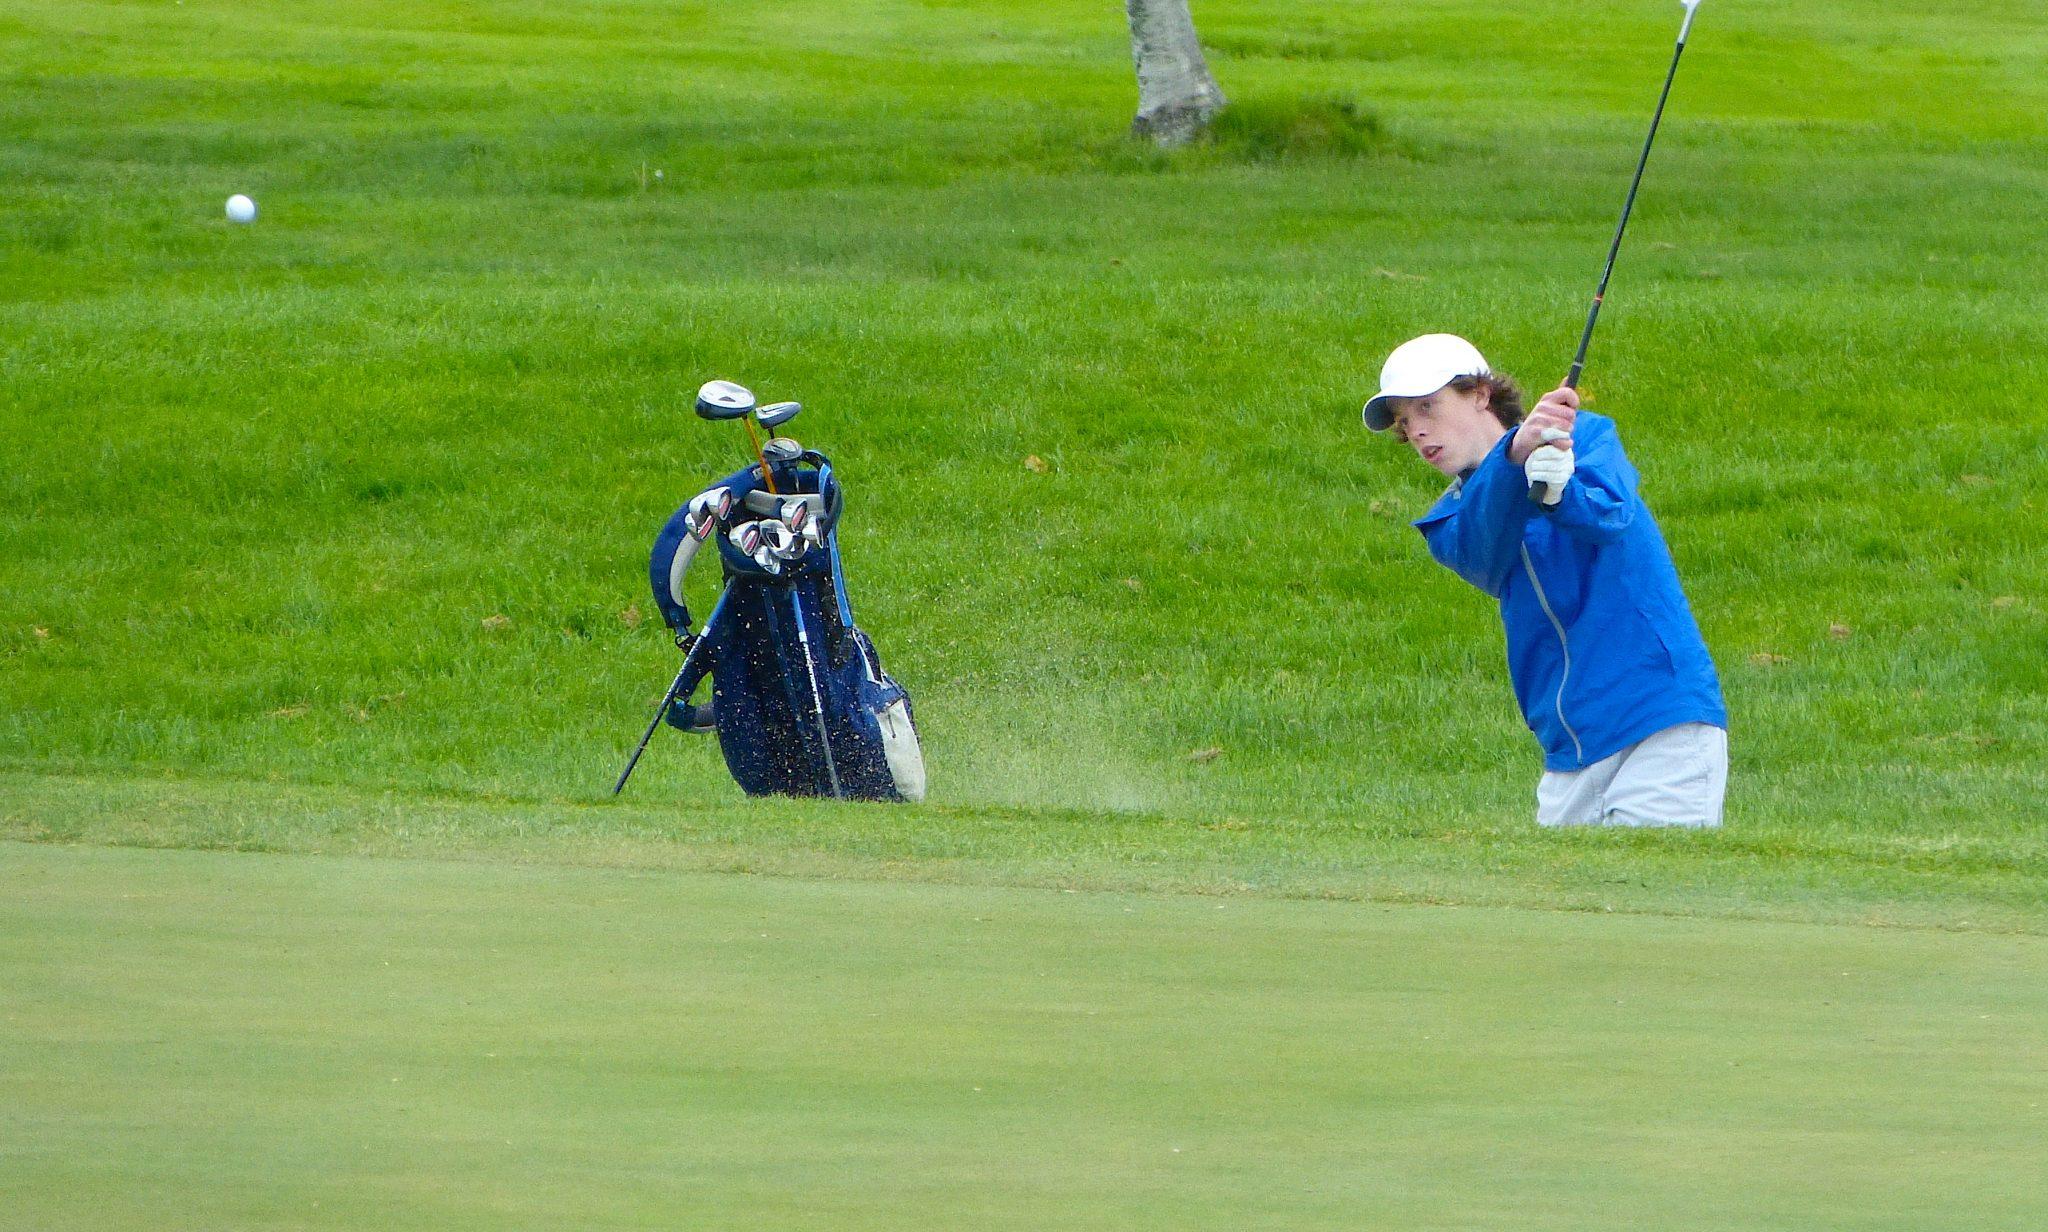 VIDEO: Berkshire League golf tournament highlights | The Zones